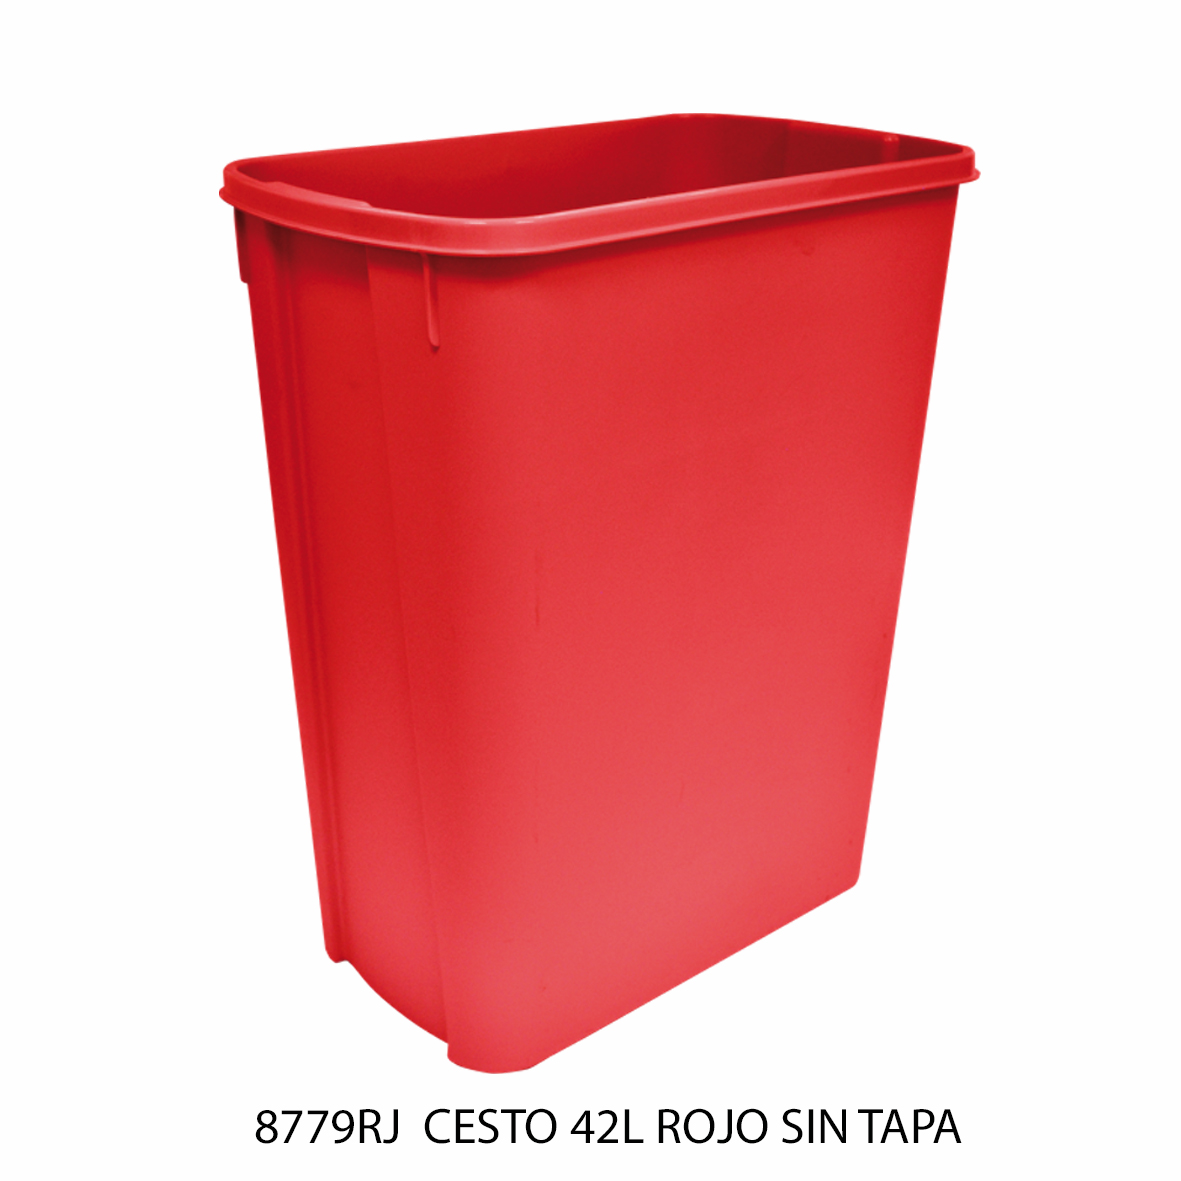 Bote de basura mediano de 42 litros sin tapa color rojo modelo 8779RJ de Sablón